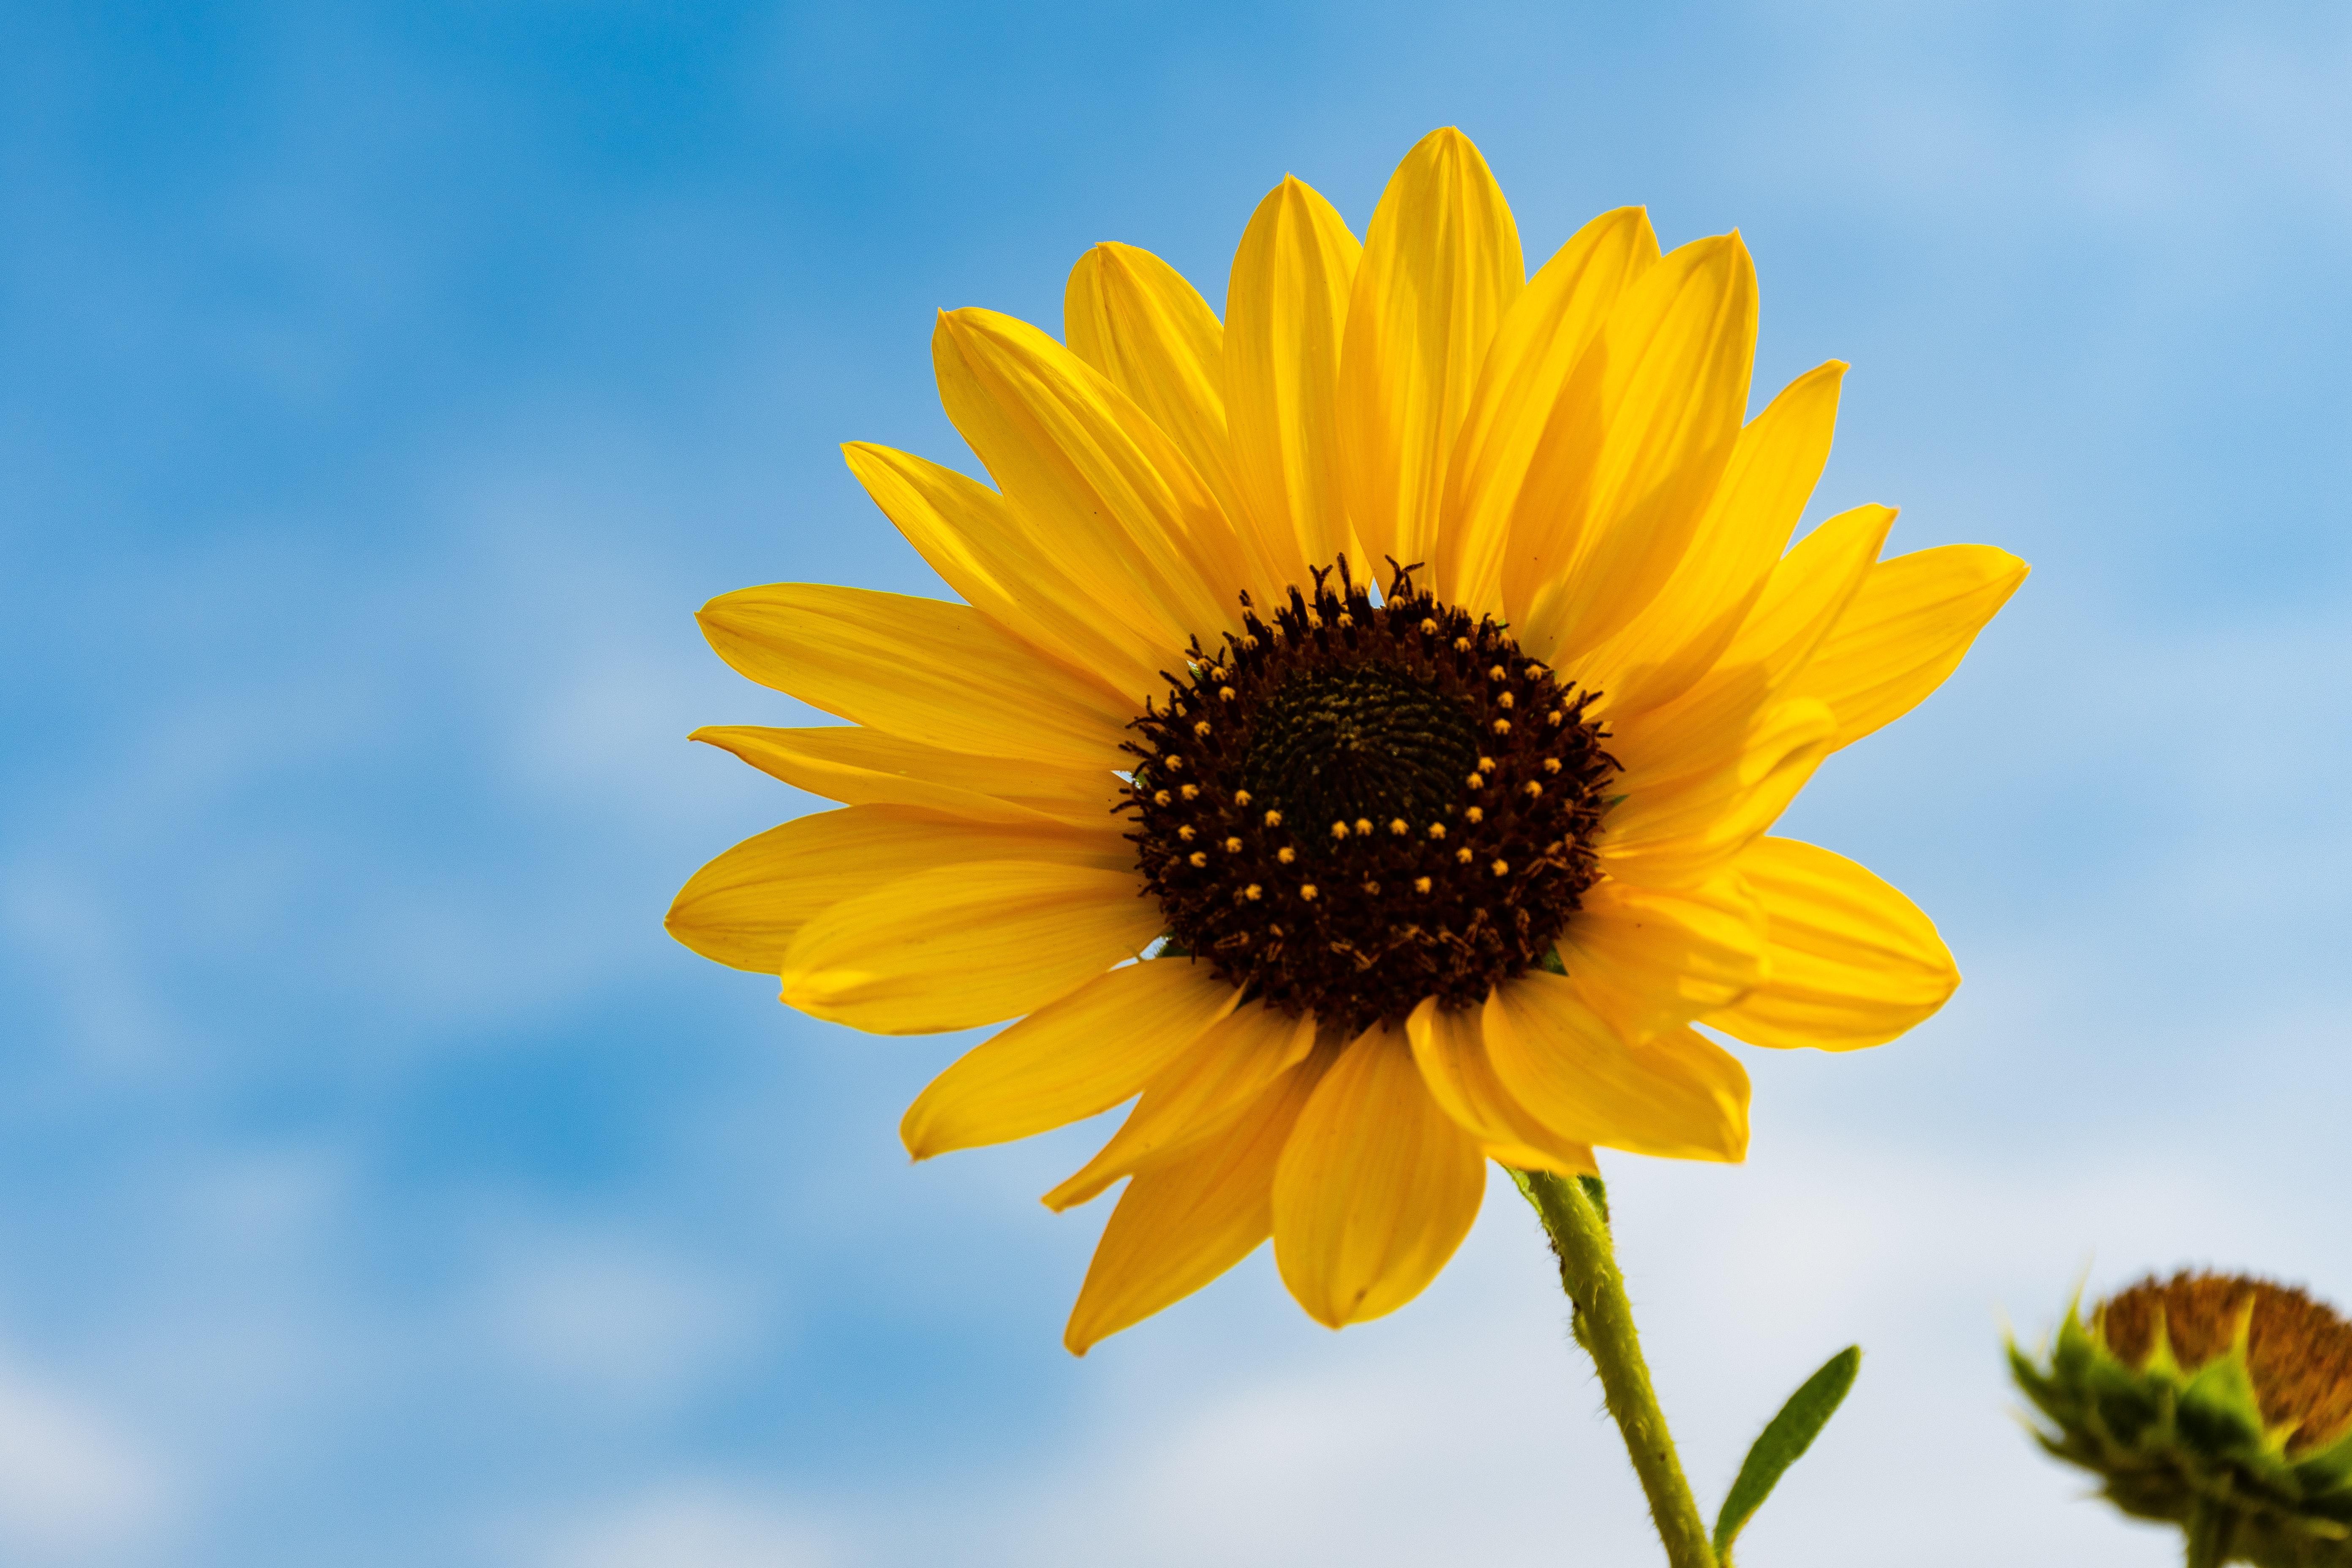 500+ Gambar Bunga Matahari Wallpaper HD